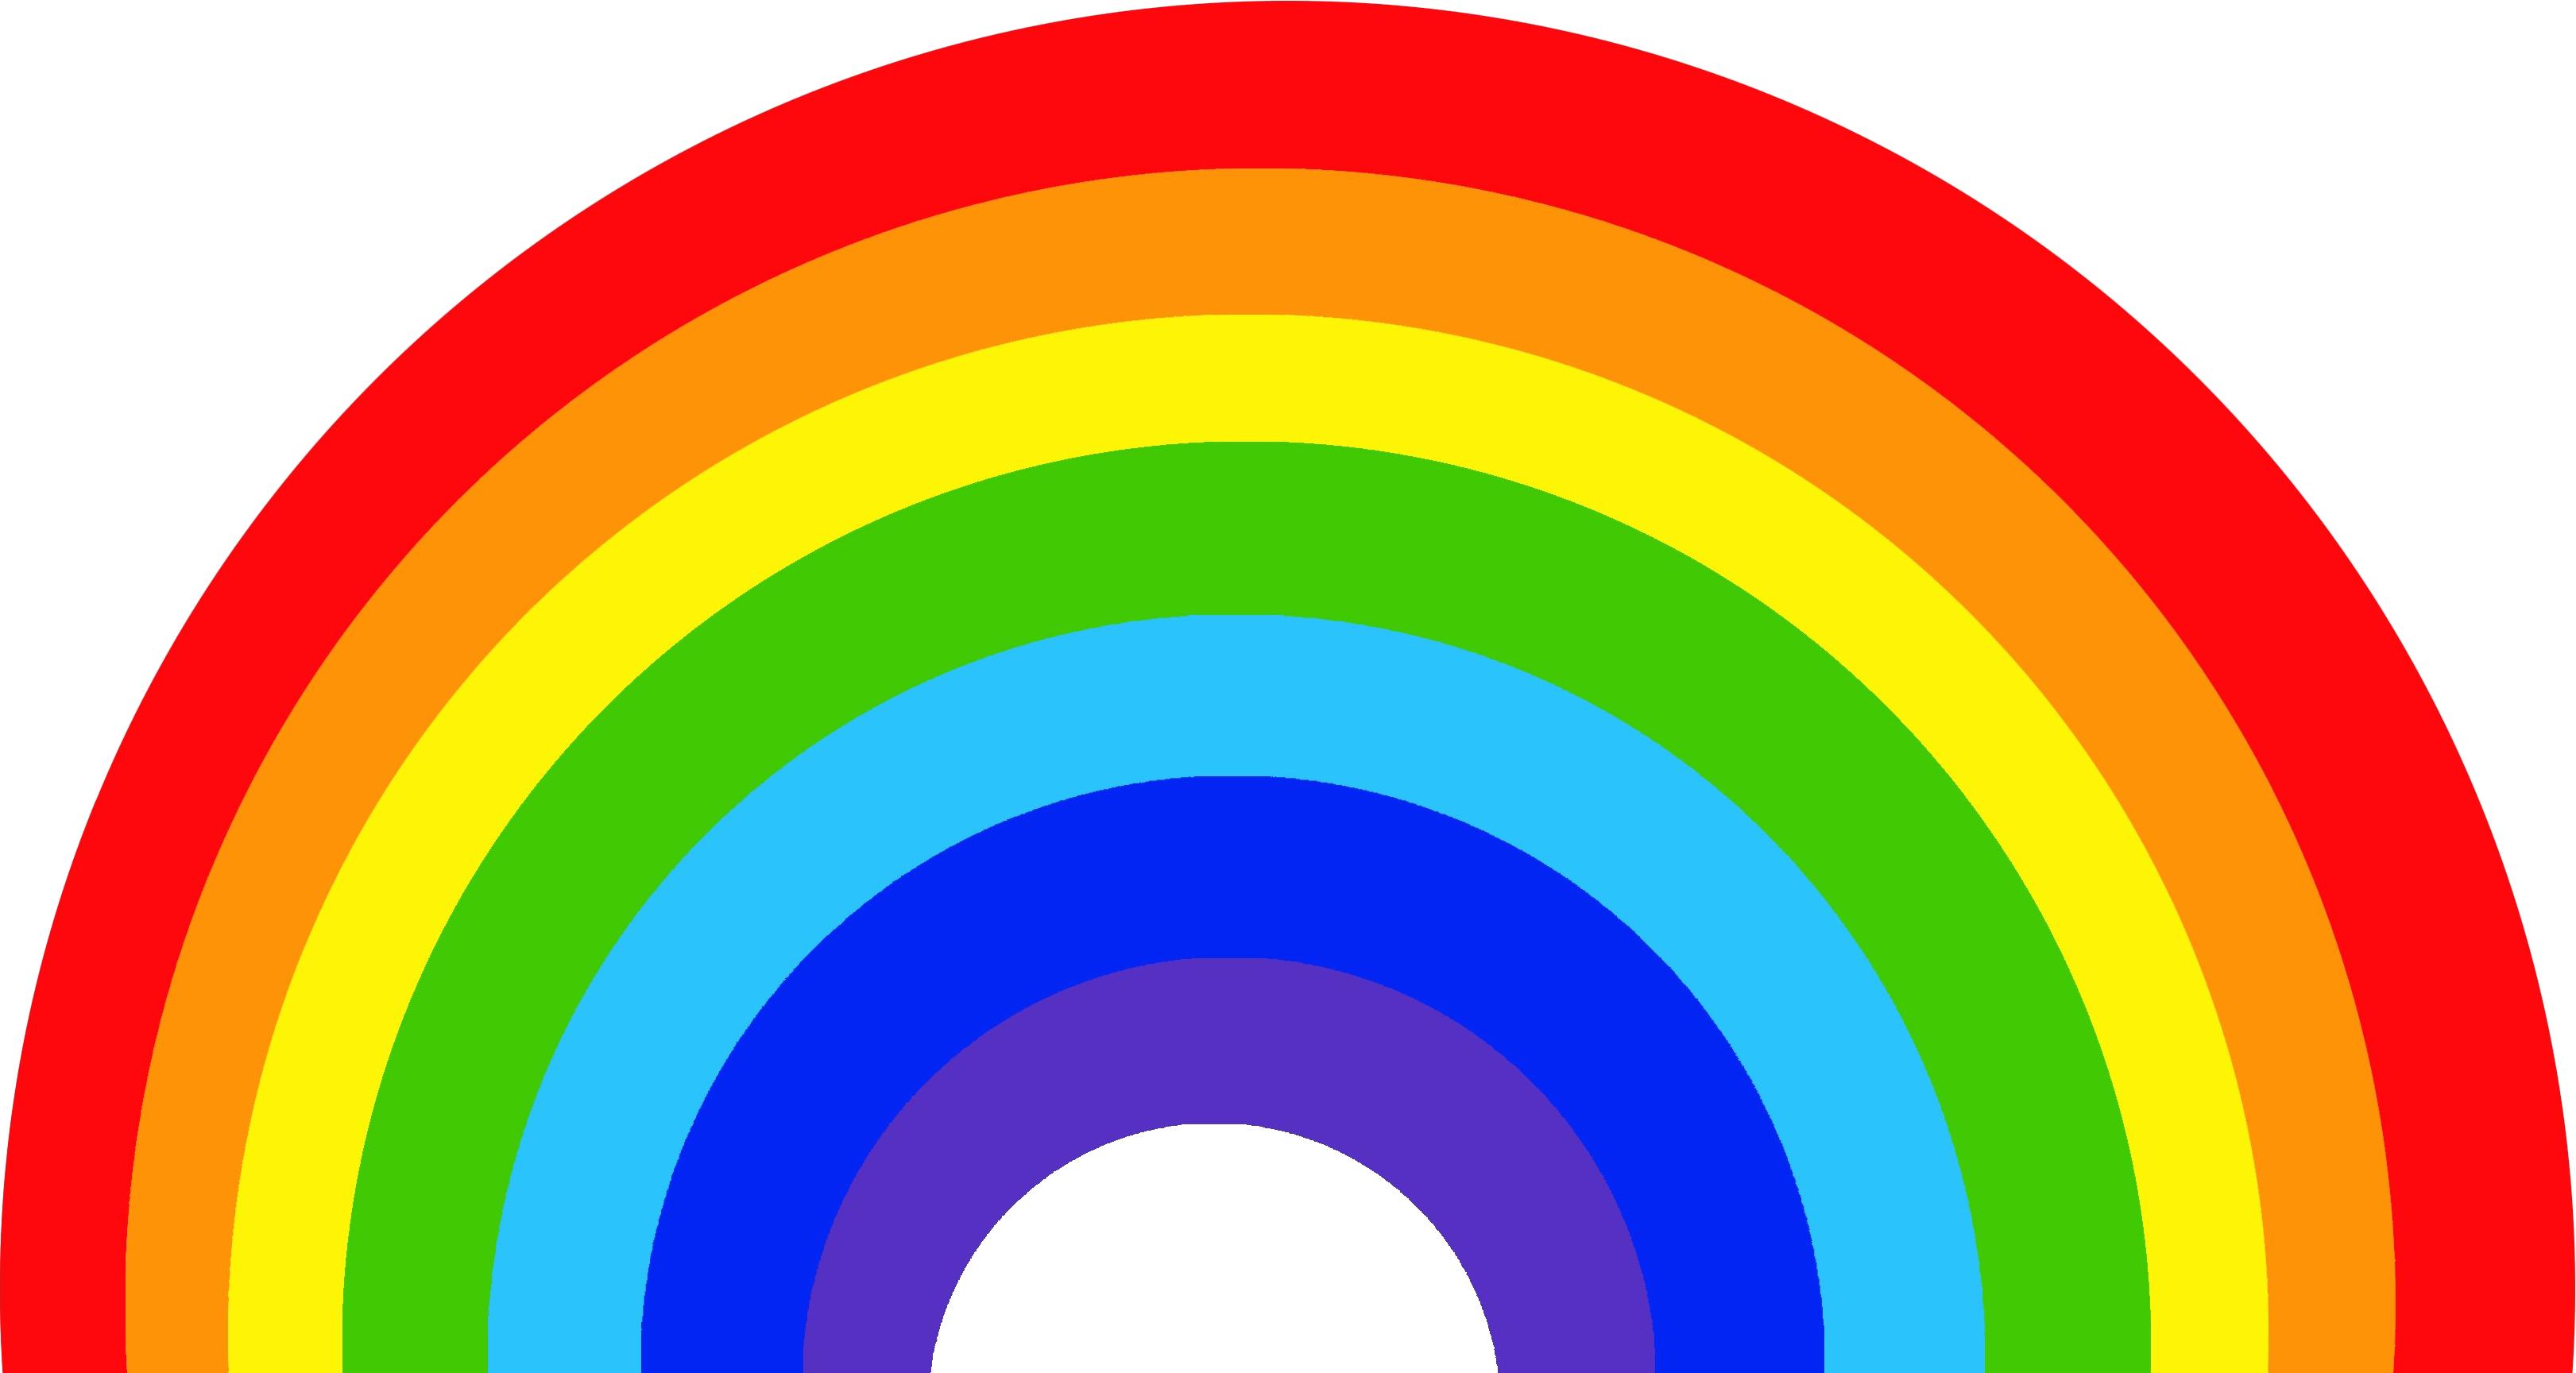 rainbow color wallpaper kids - photo #38